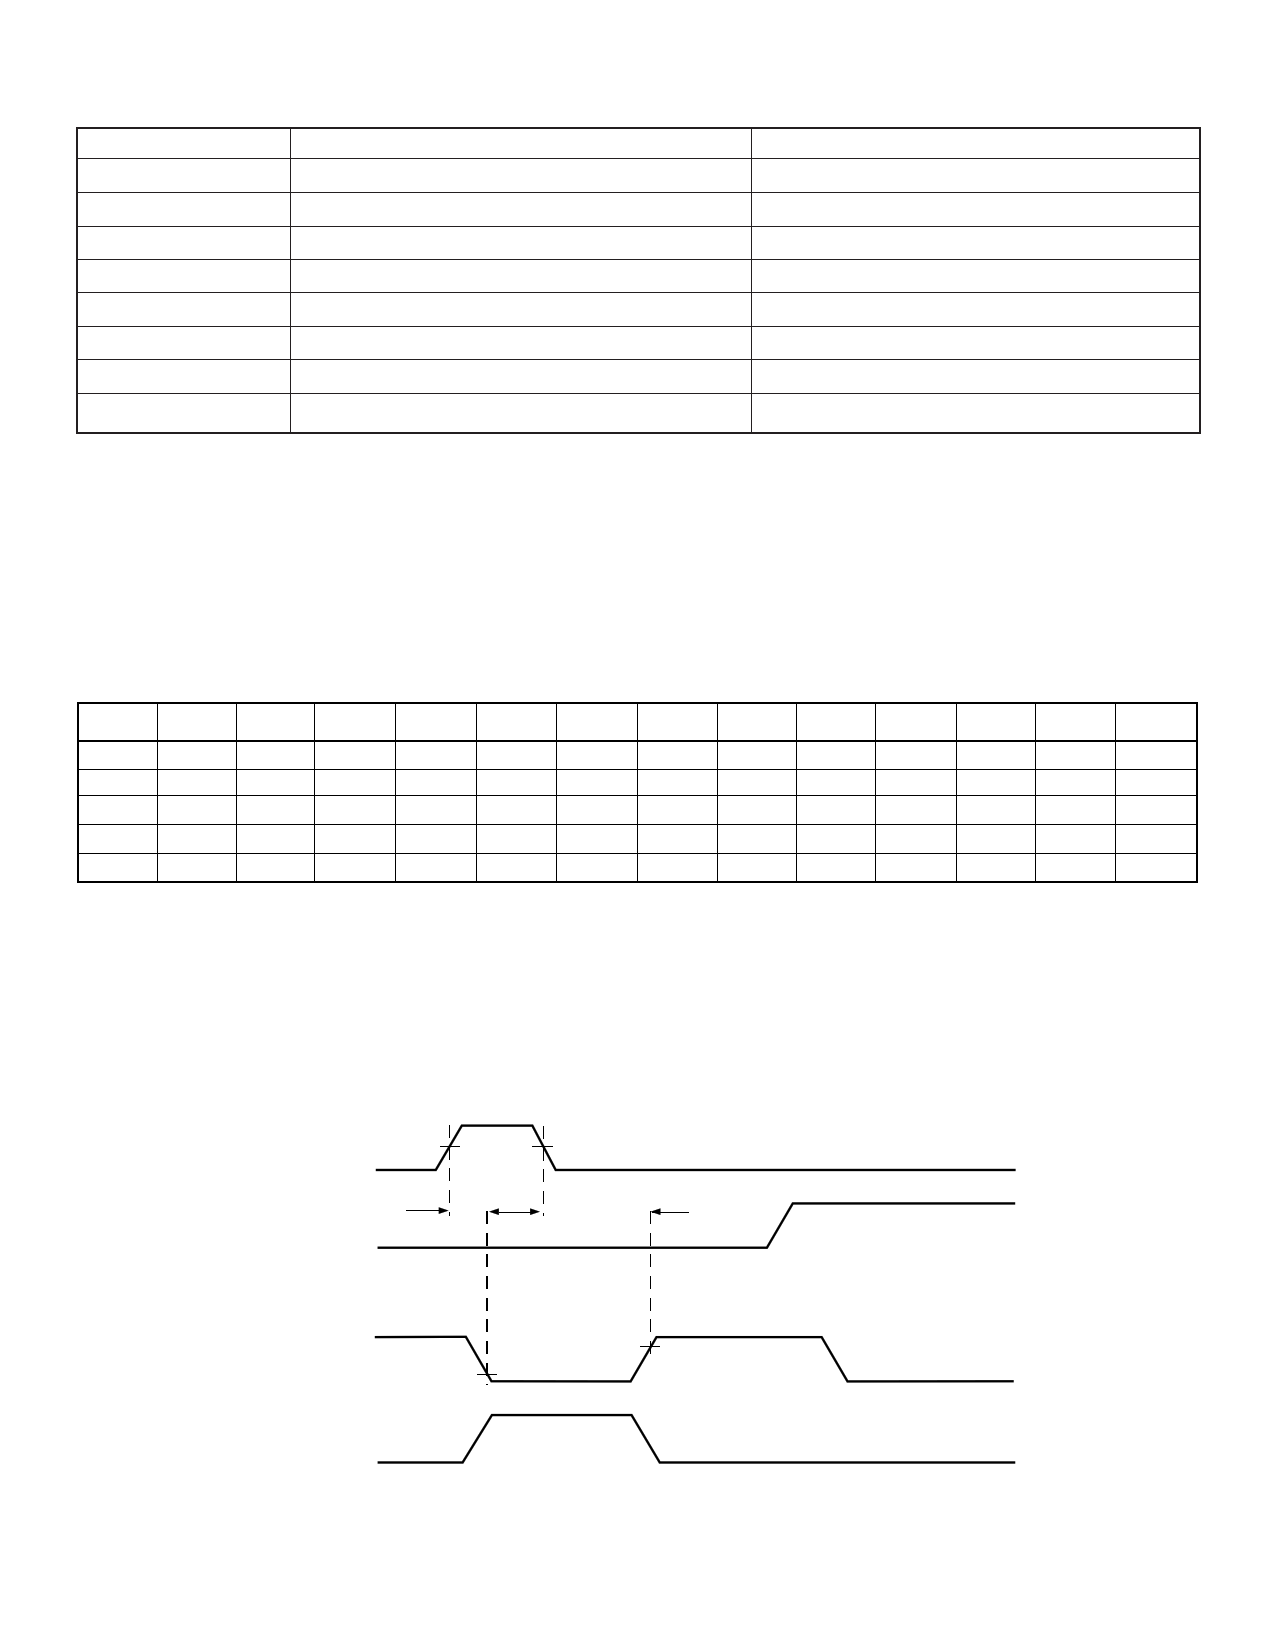 HV20720PJ pdf, ピン配列